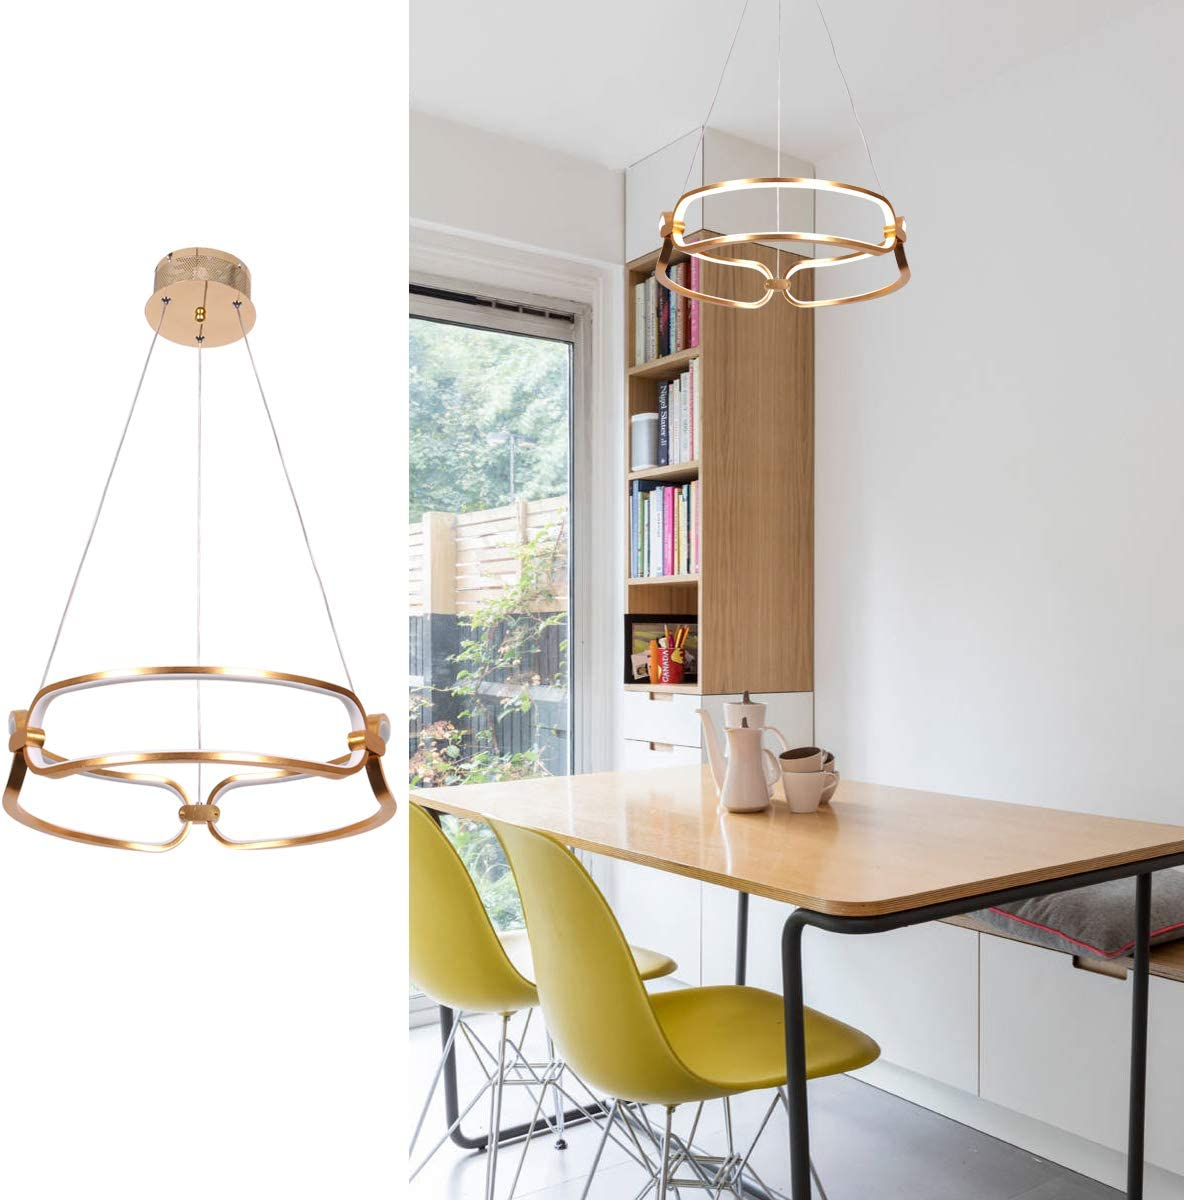 Modern LED Ceiling Light, CHYING 2-Ring 40W Pendant Light Adjustable Chandelier Light Fixtures Ceiling for Living Room Bedroom Dining Room Hotel Cool White 6000K